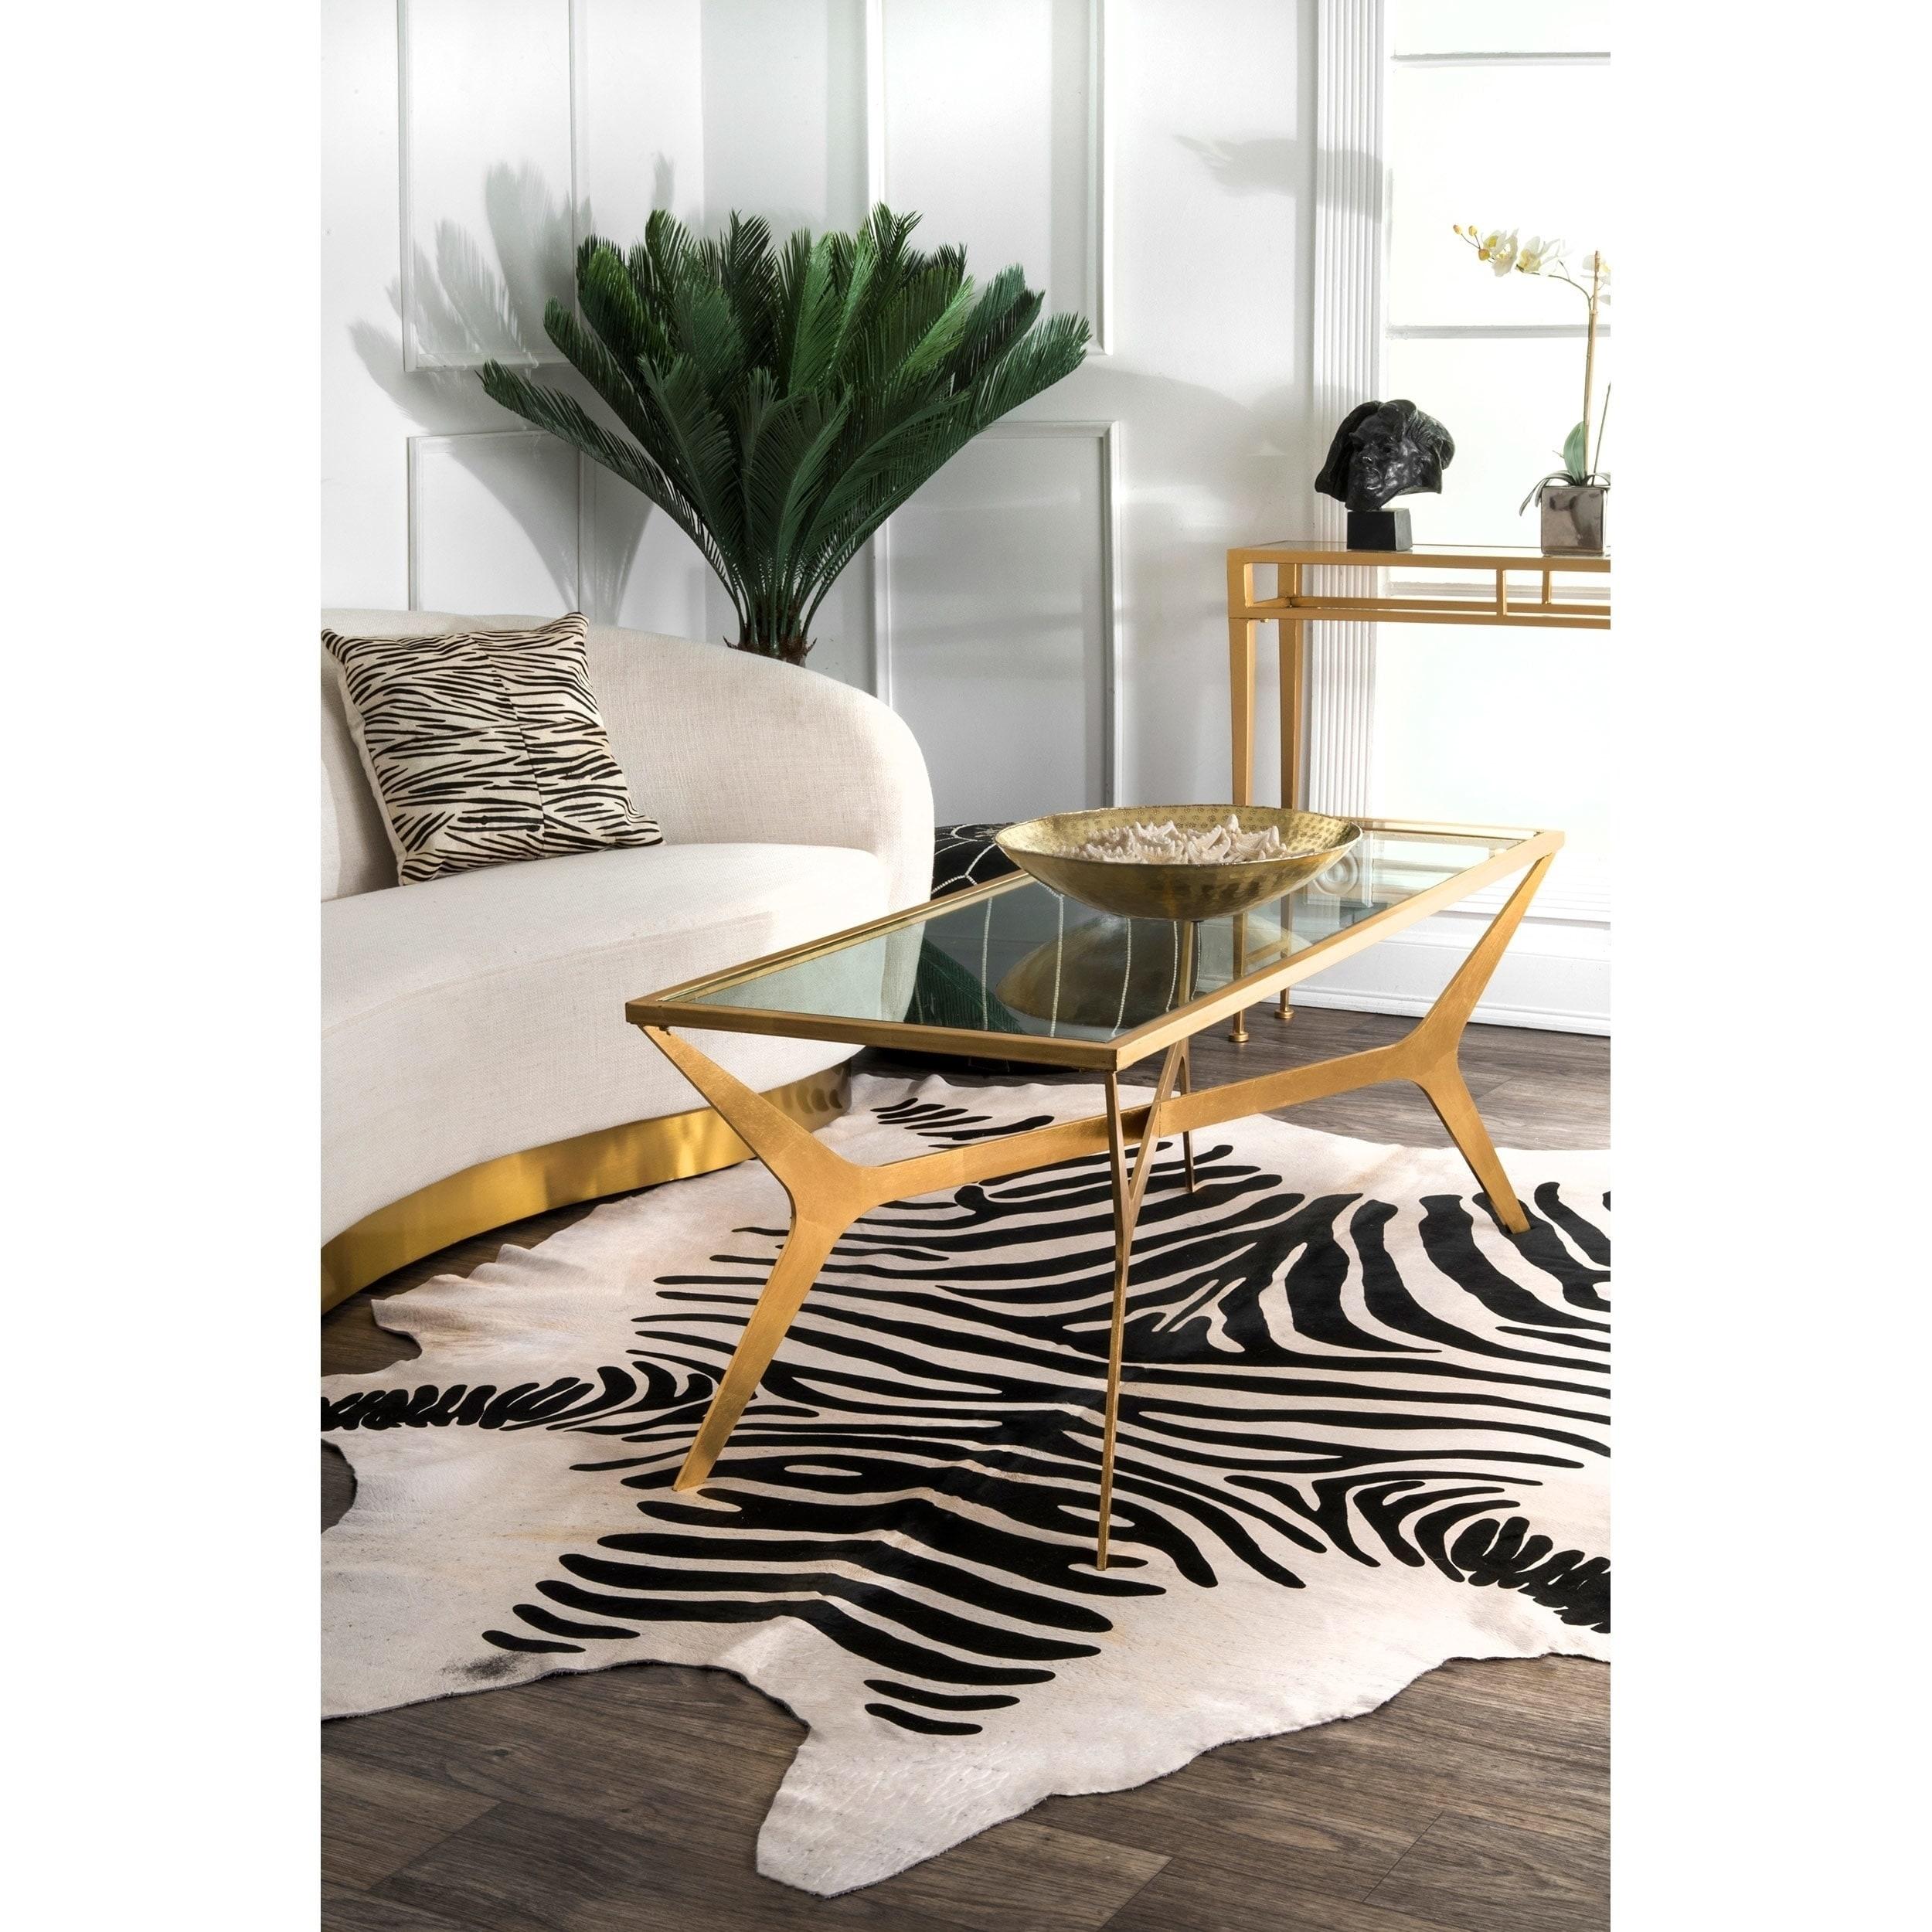 Brazilian Zebra Cowhide Area Rug